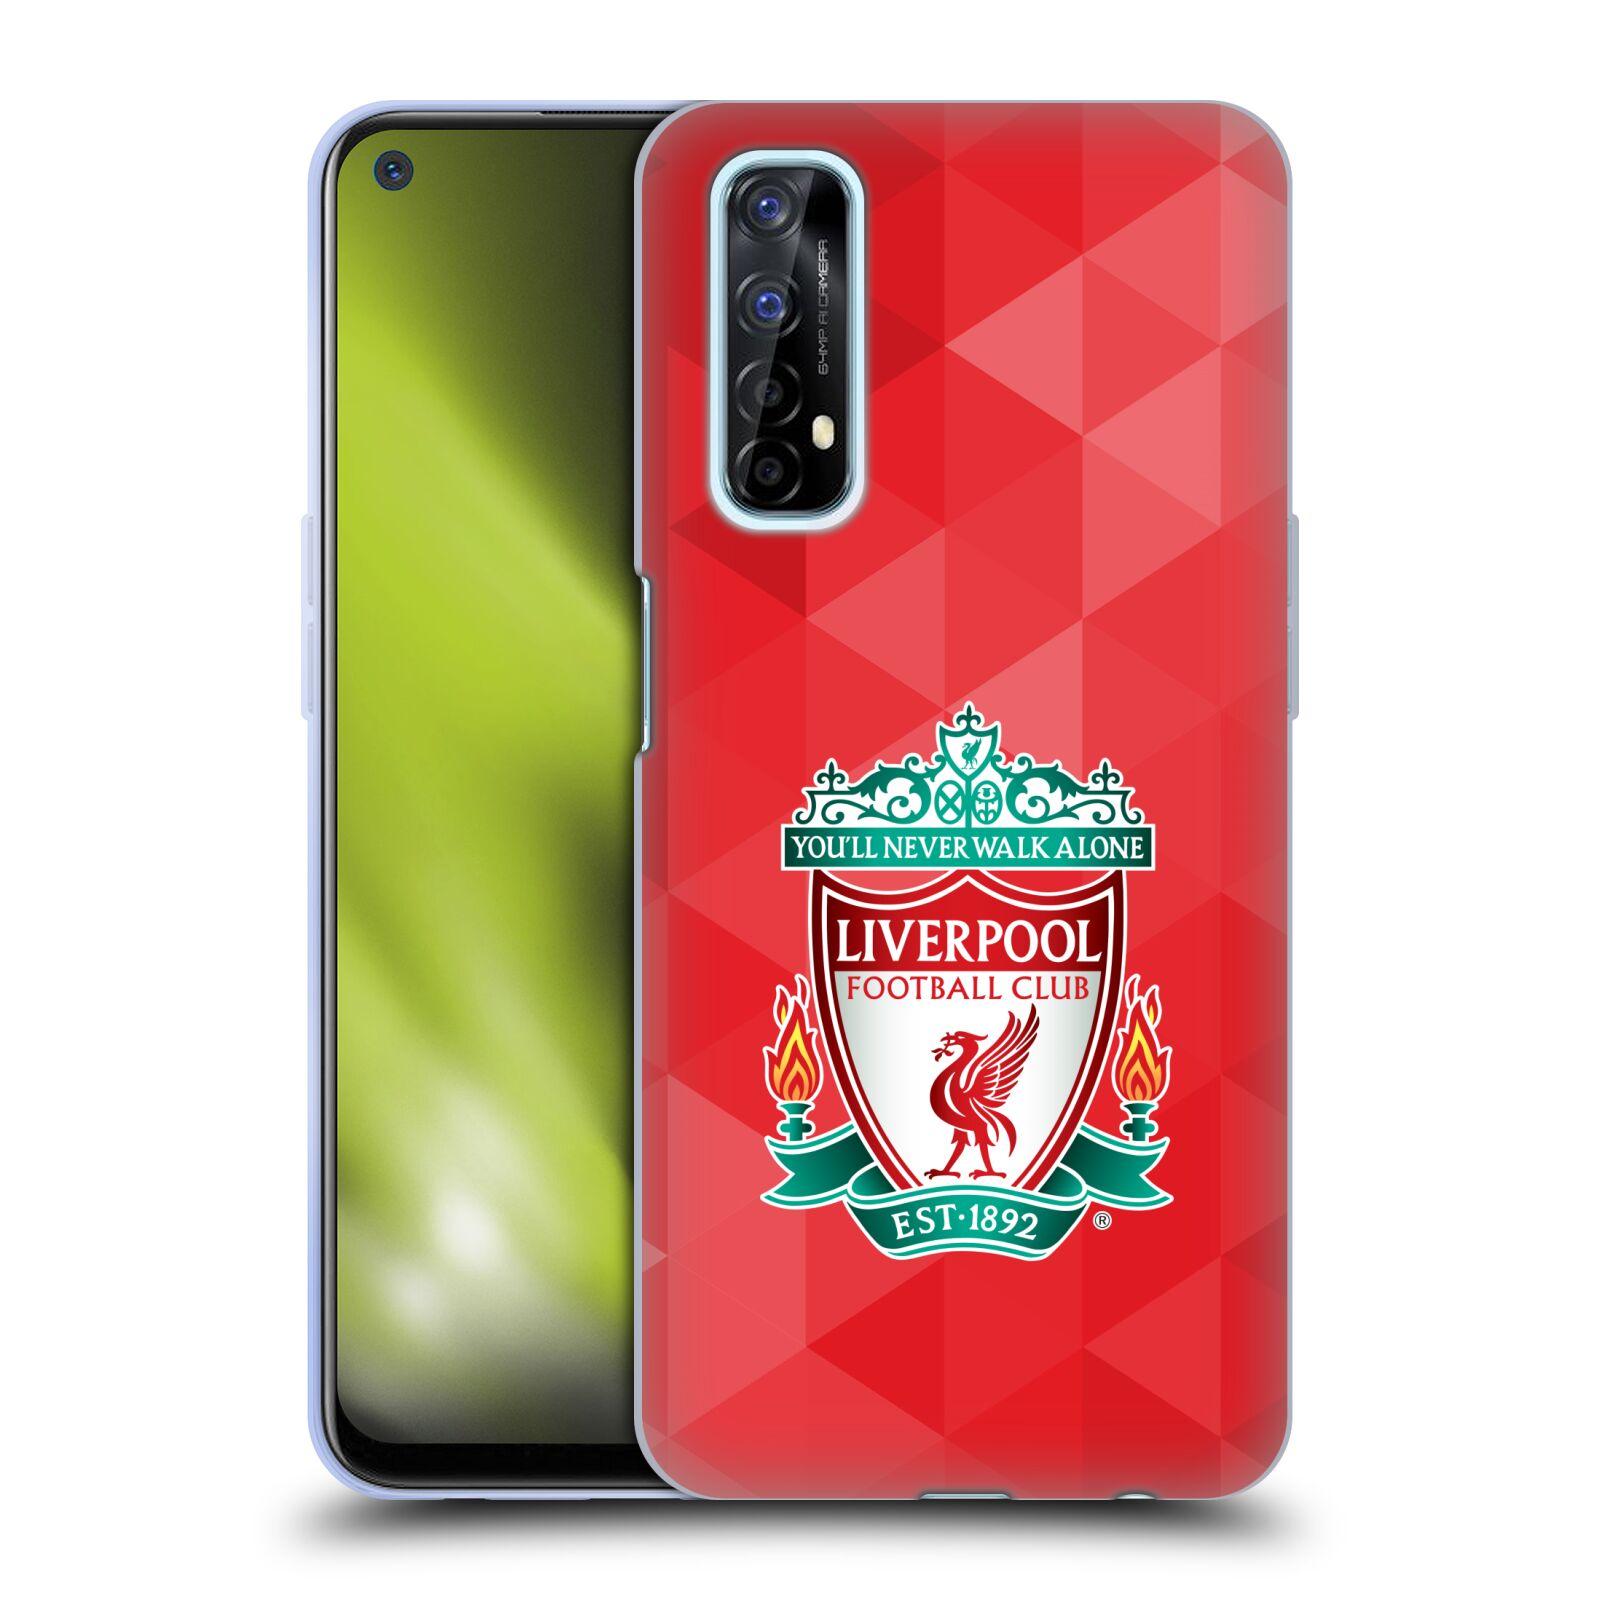 Silikonové pouzdro na mobil Realme 7 - Head Case - ZNAK LIVERPOOL FC OFFICIAL GEOMETRIC RED